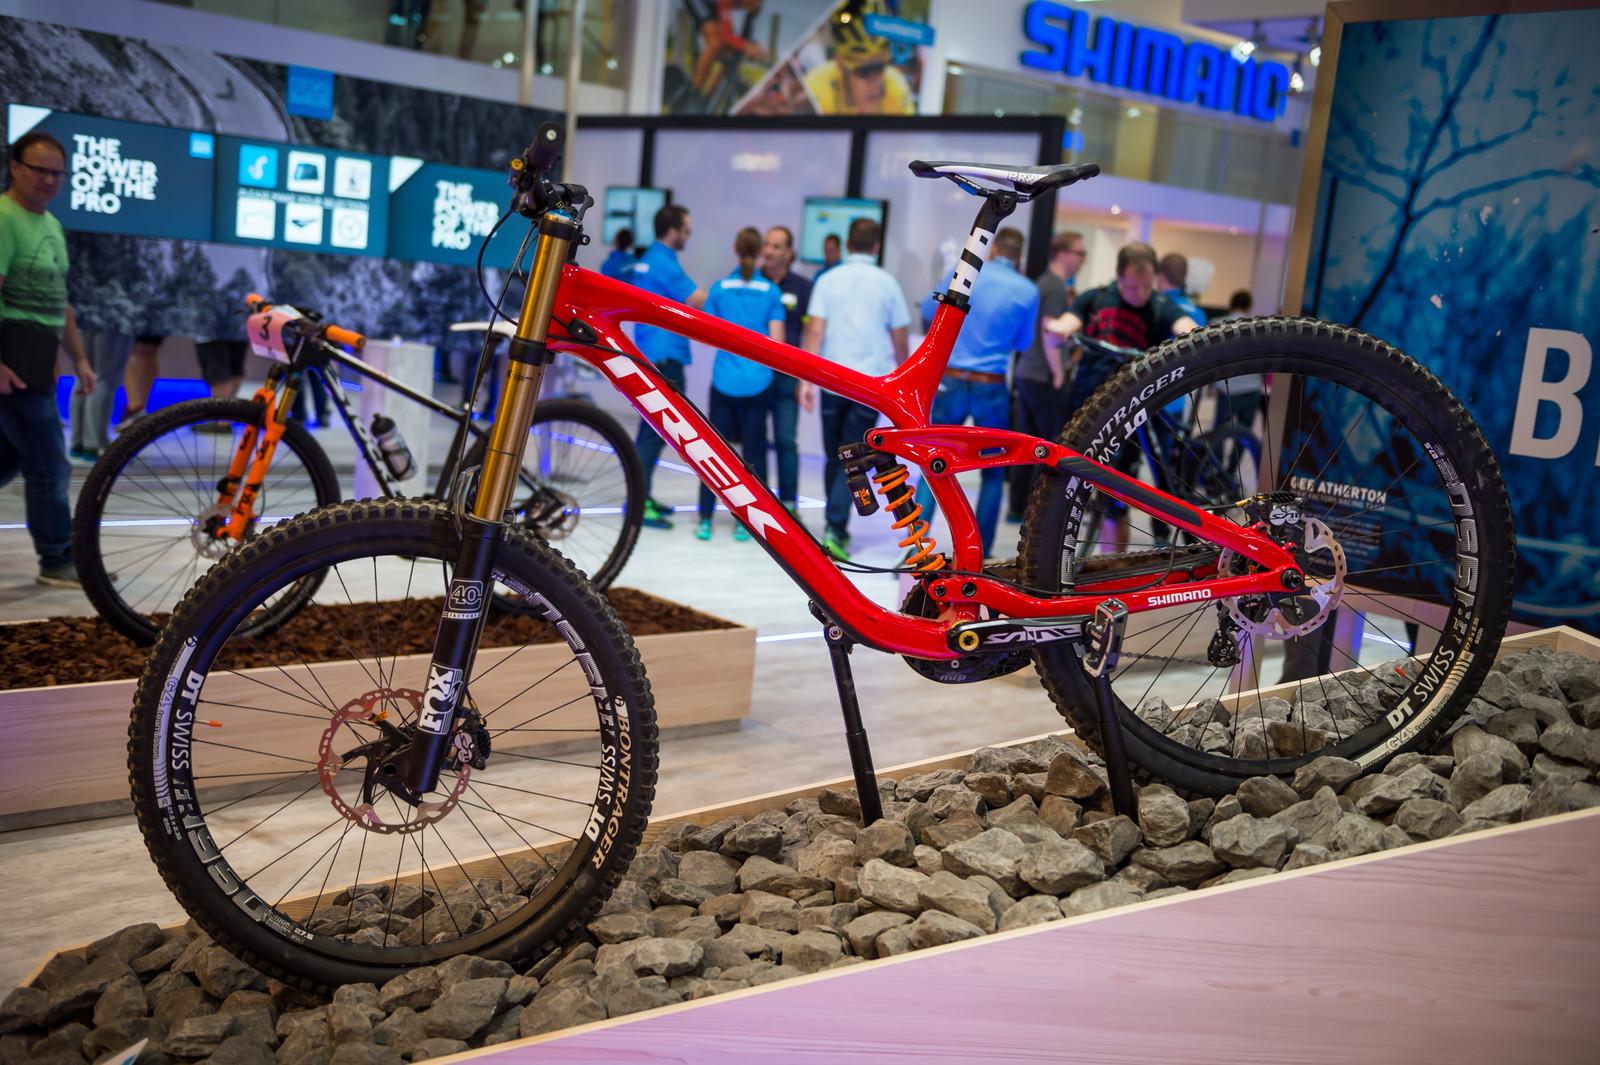 Gee Atherton's Trek Session - EUROBIKE - 2017 Downhill Bikes and Gear - Mountain Biking Pictures - Vital MTB